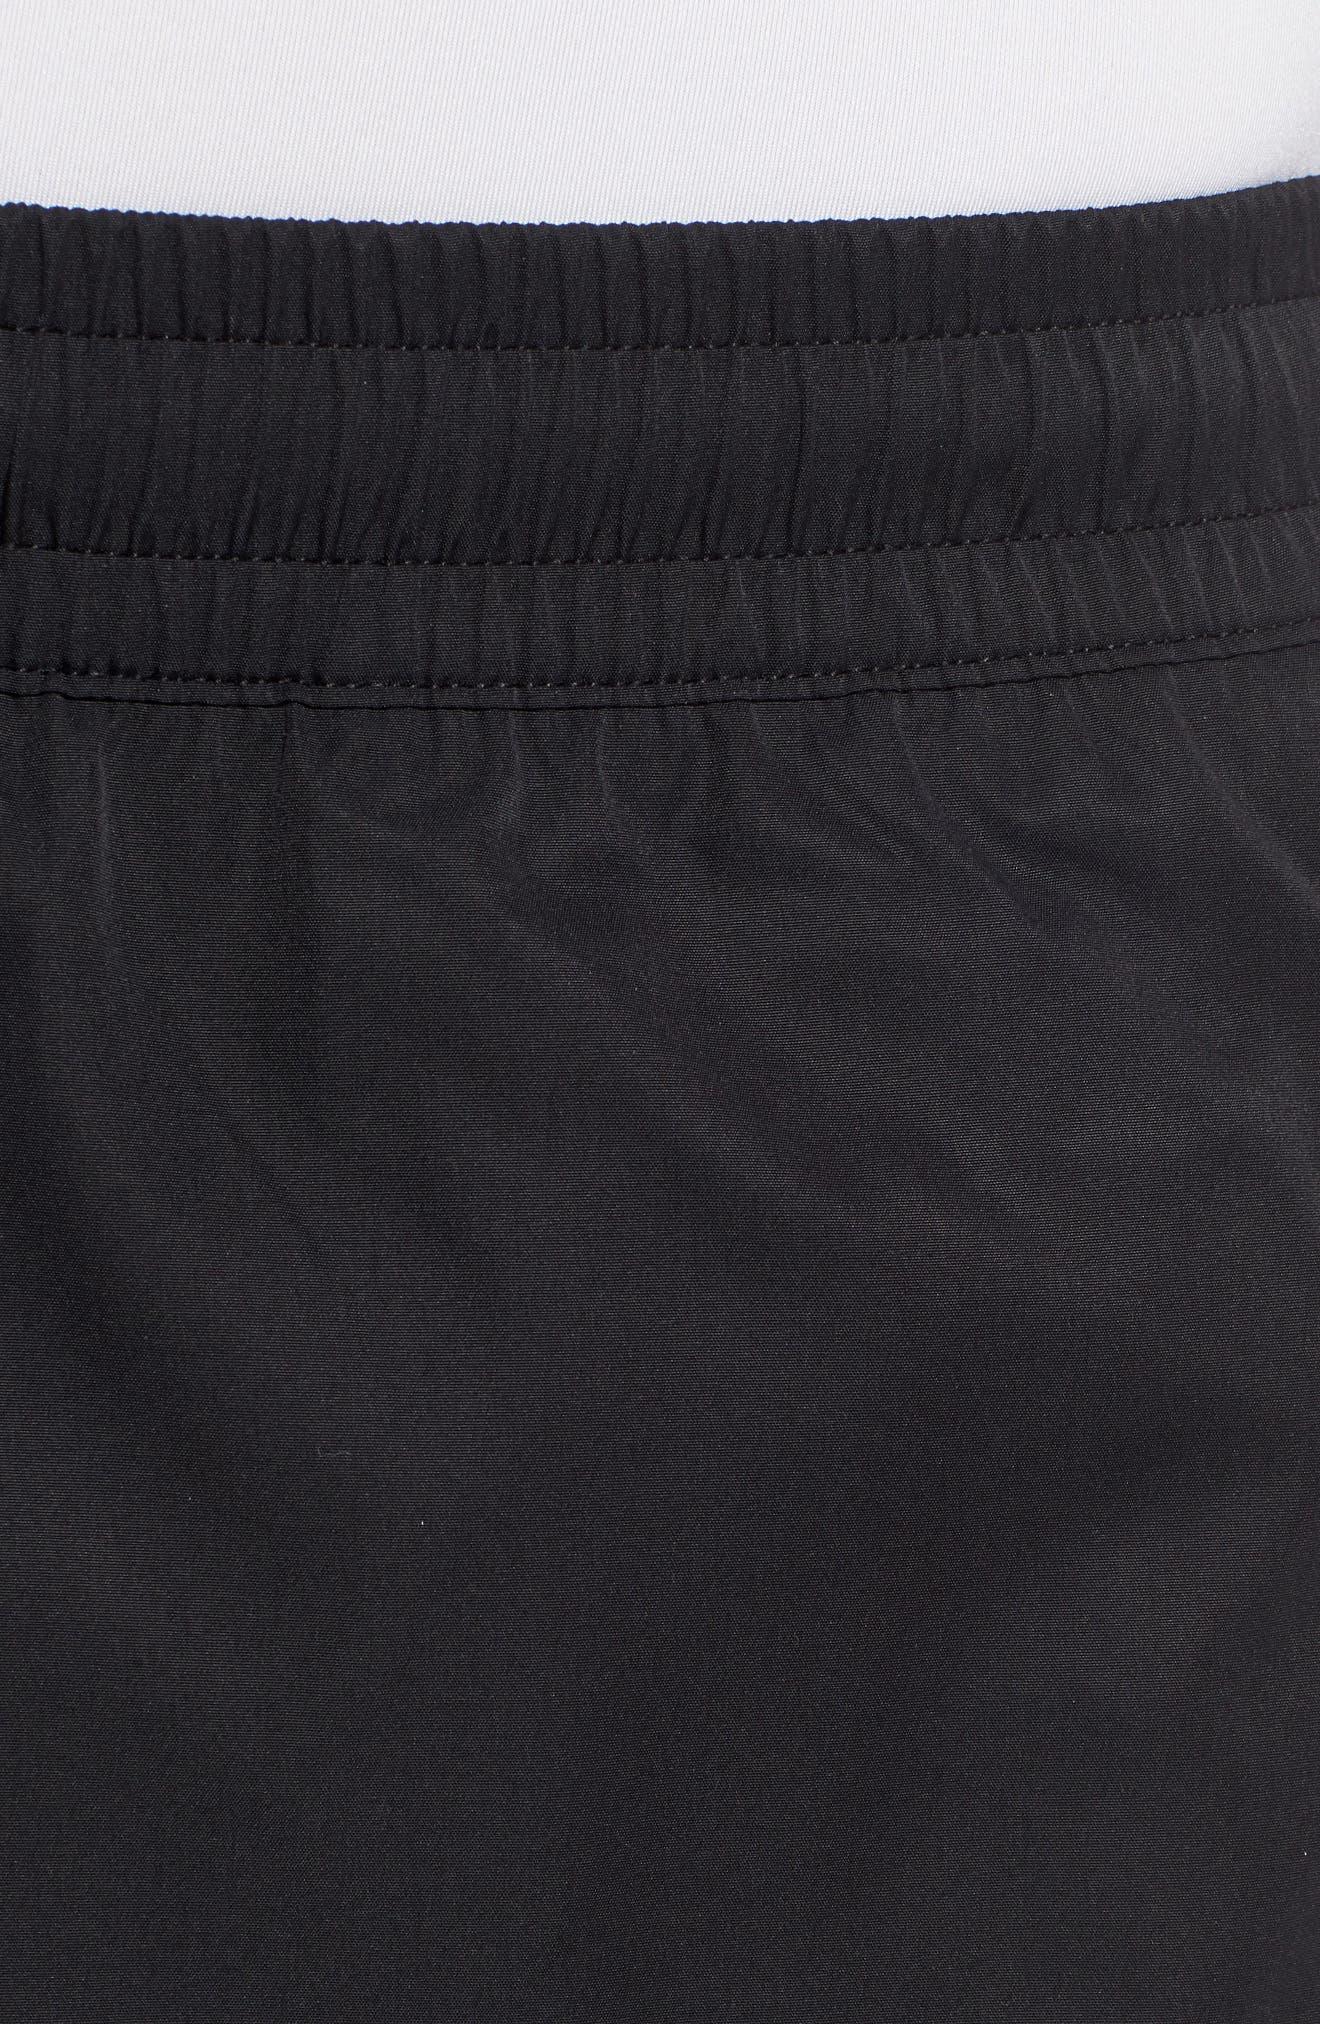 NSW Archive Shorts,                             Alternate thumbnail 4, color,                             BLACK/ SAIL